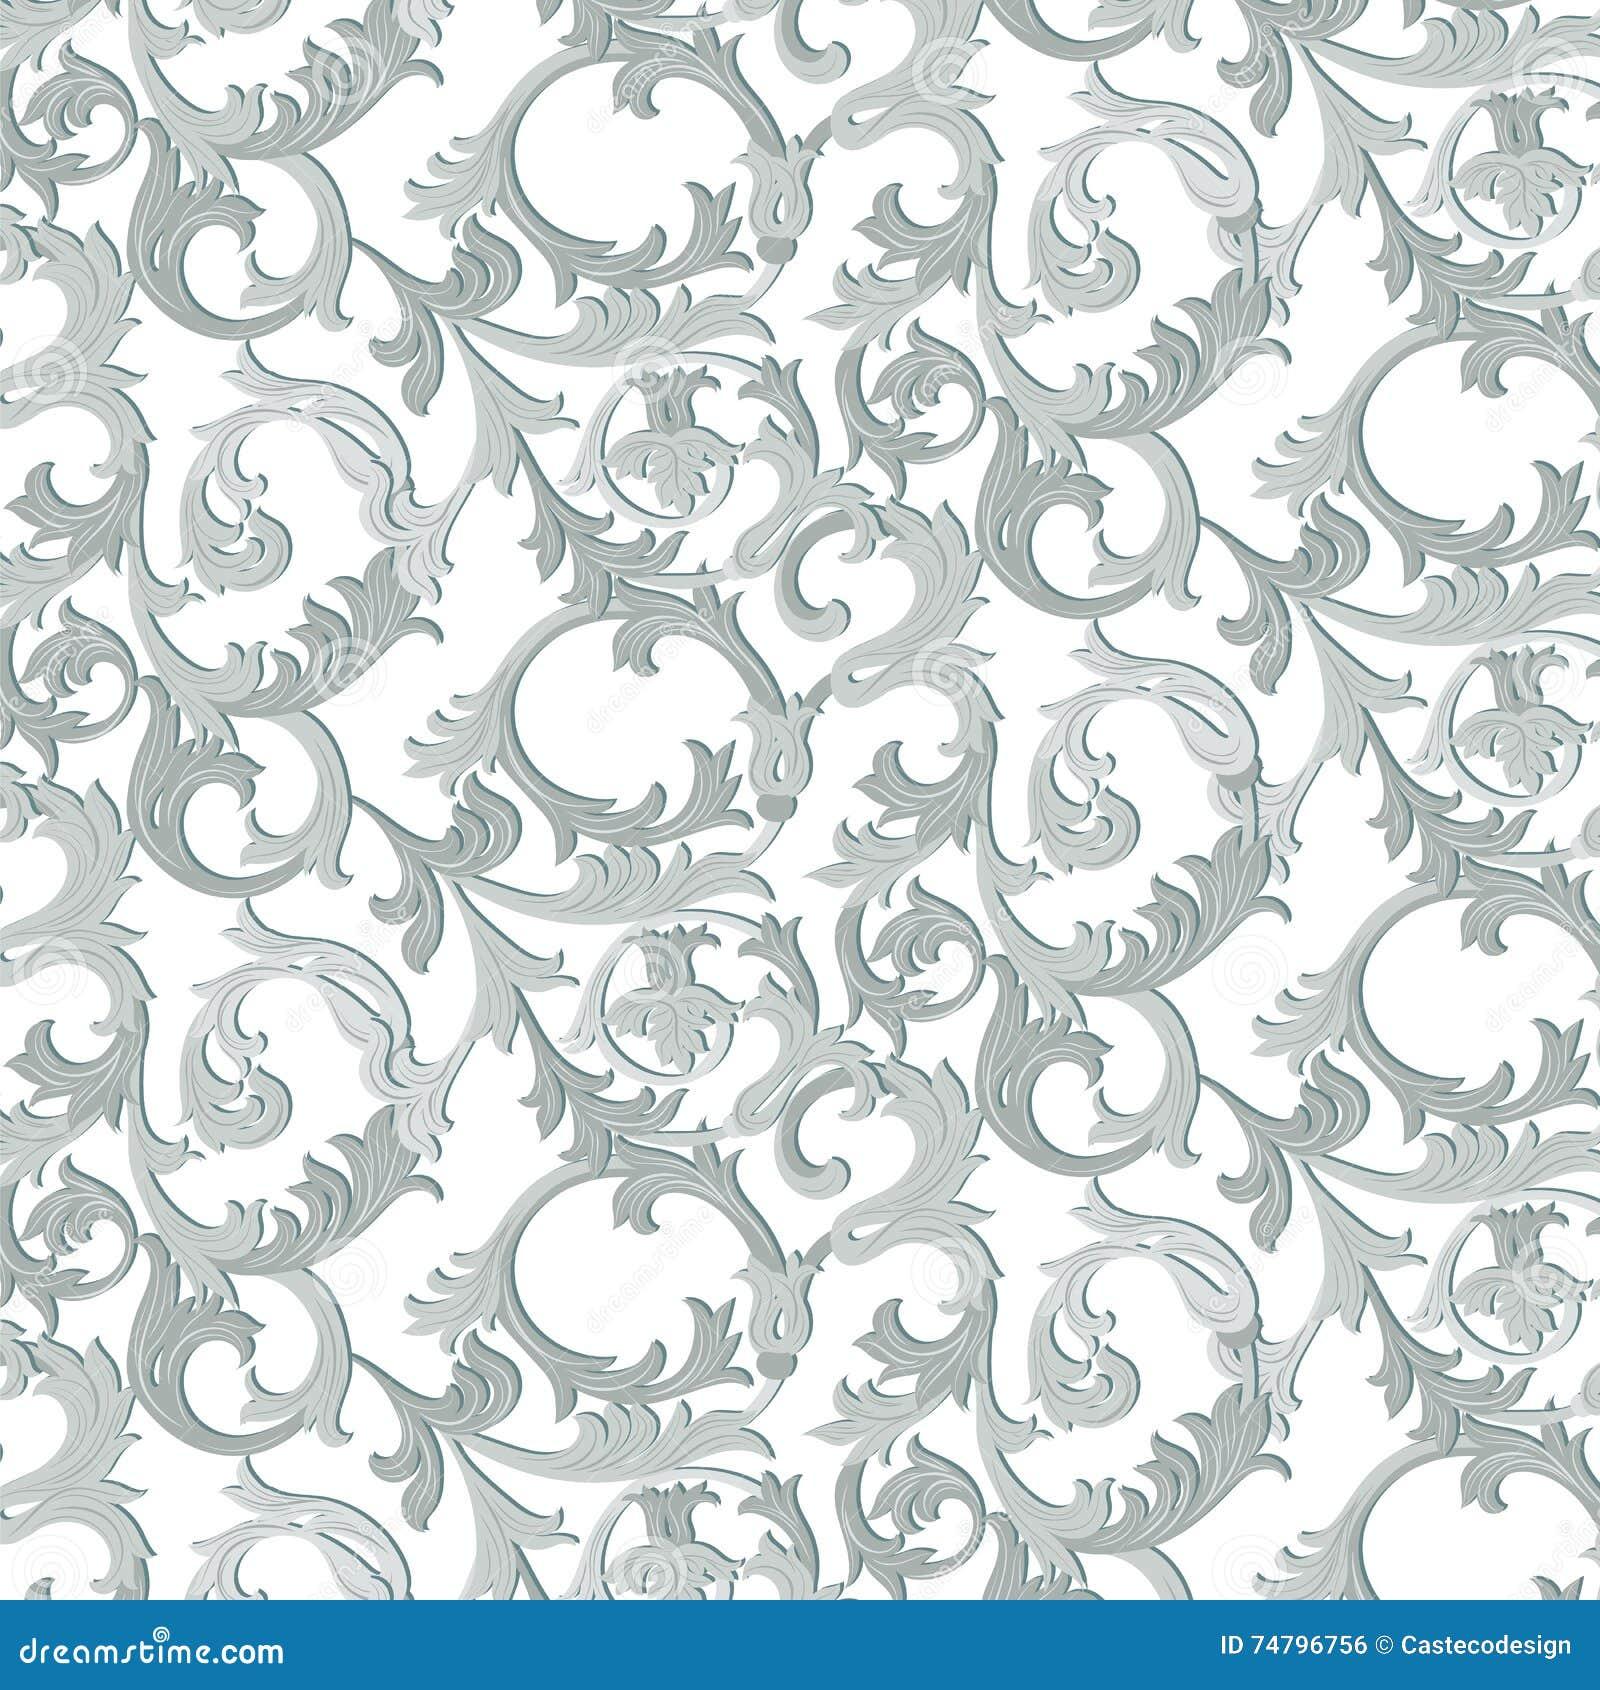 acanthus leaf ornament pattern stock vector illustration of flower acanthus 74796756 dreamstime com